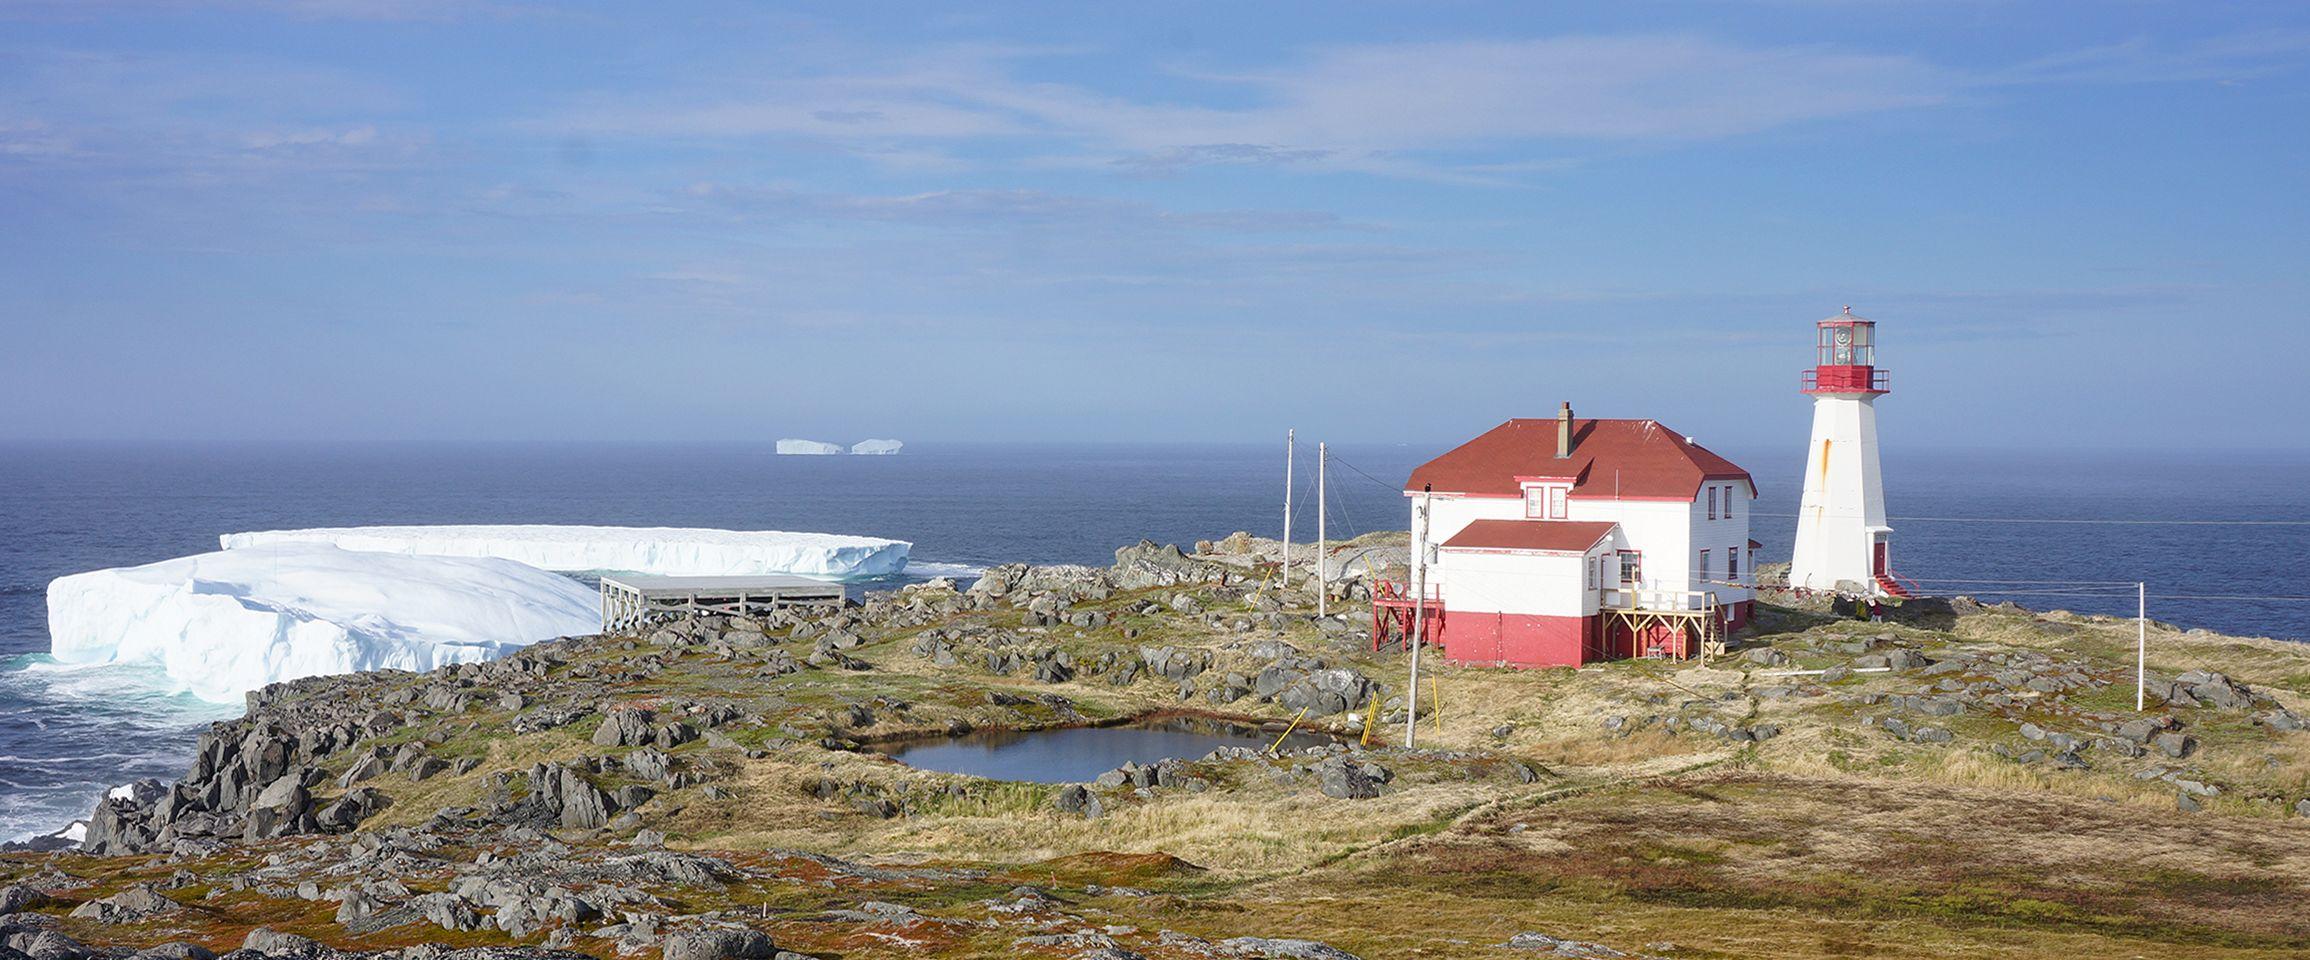 Das Quirpon Island Inn in Neufundland